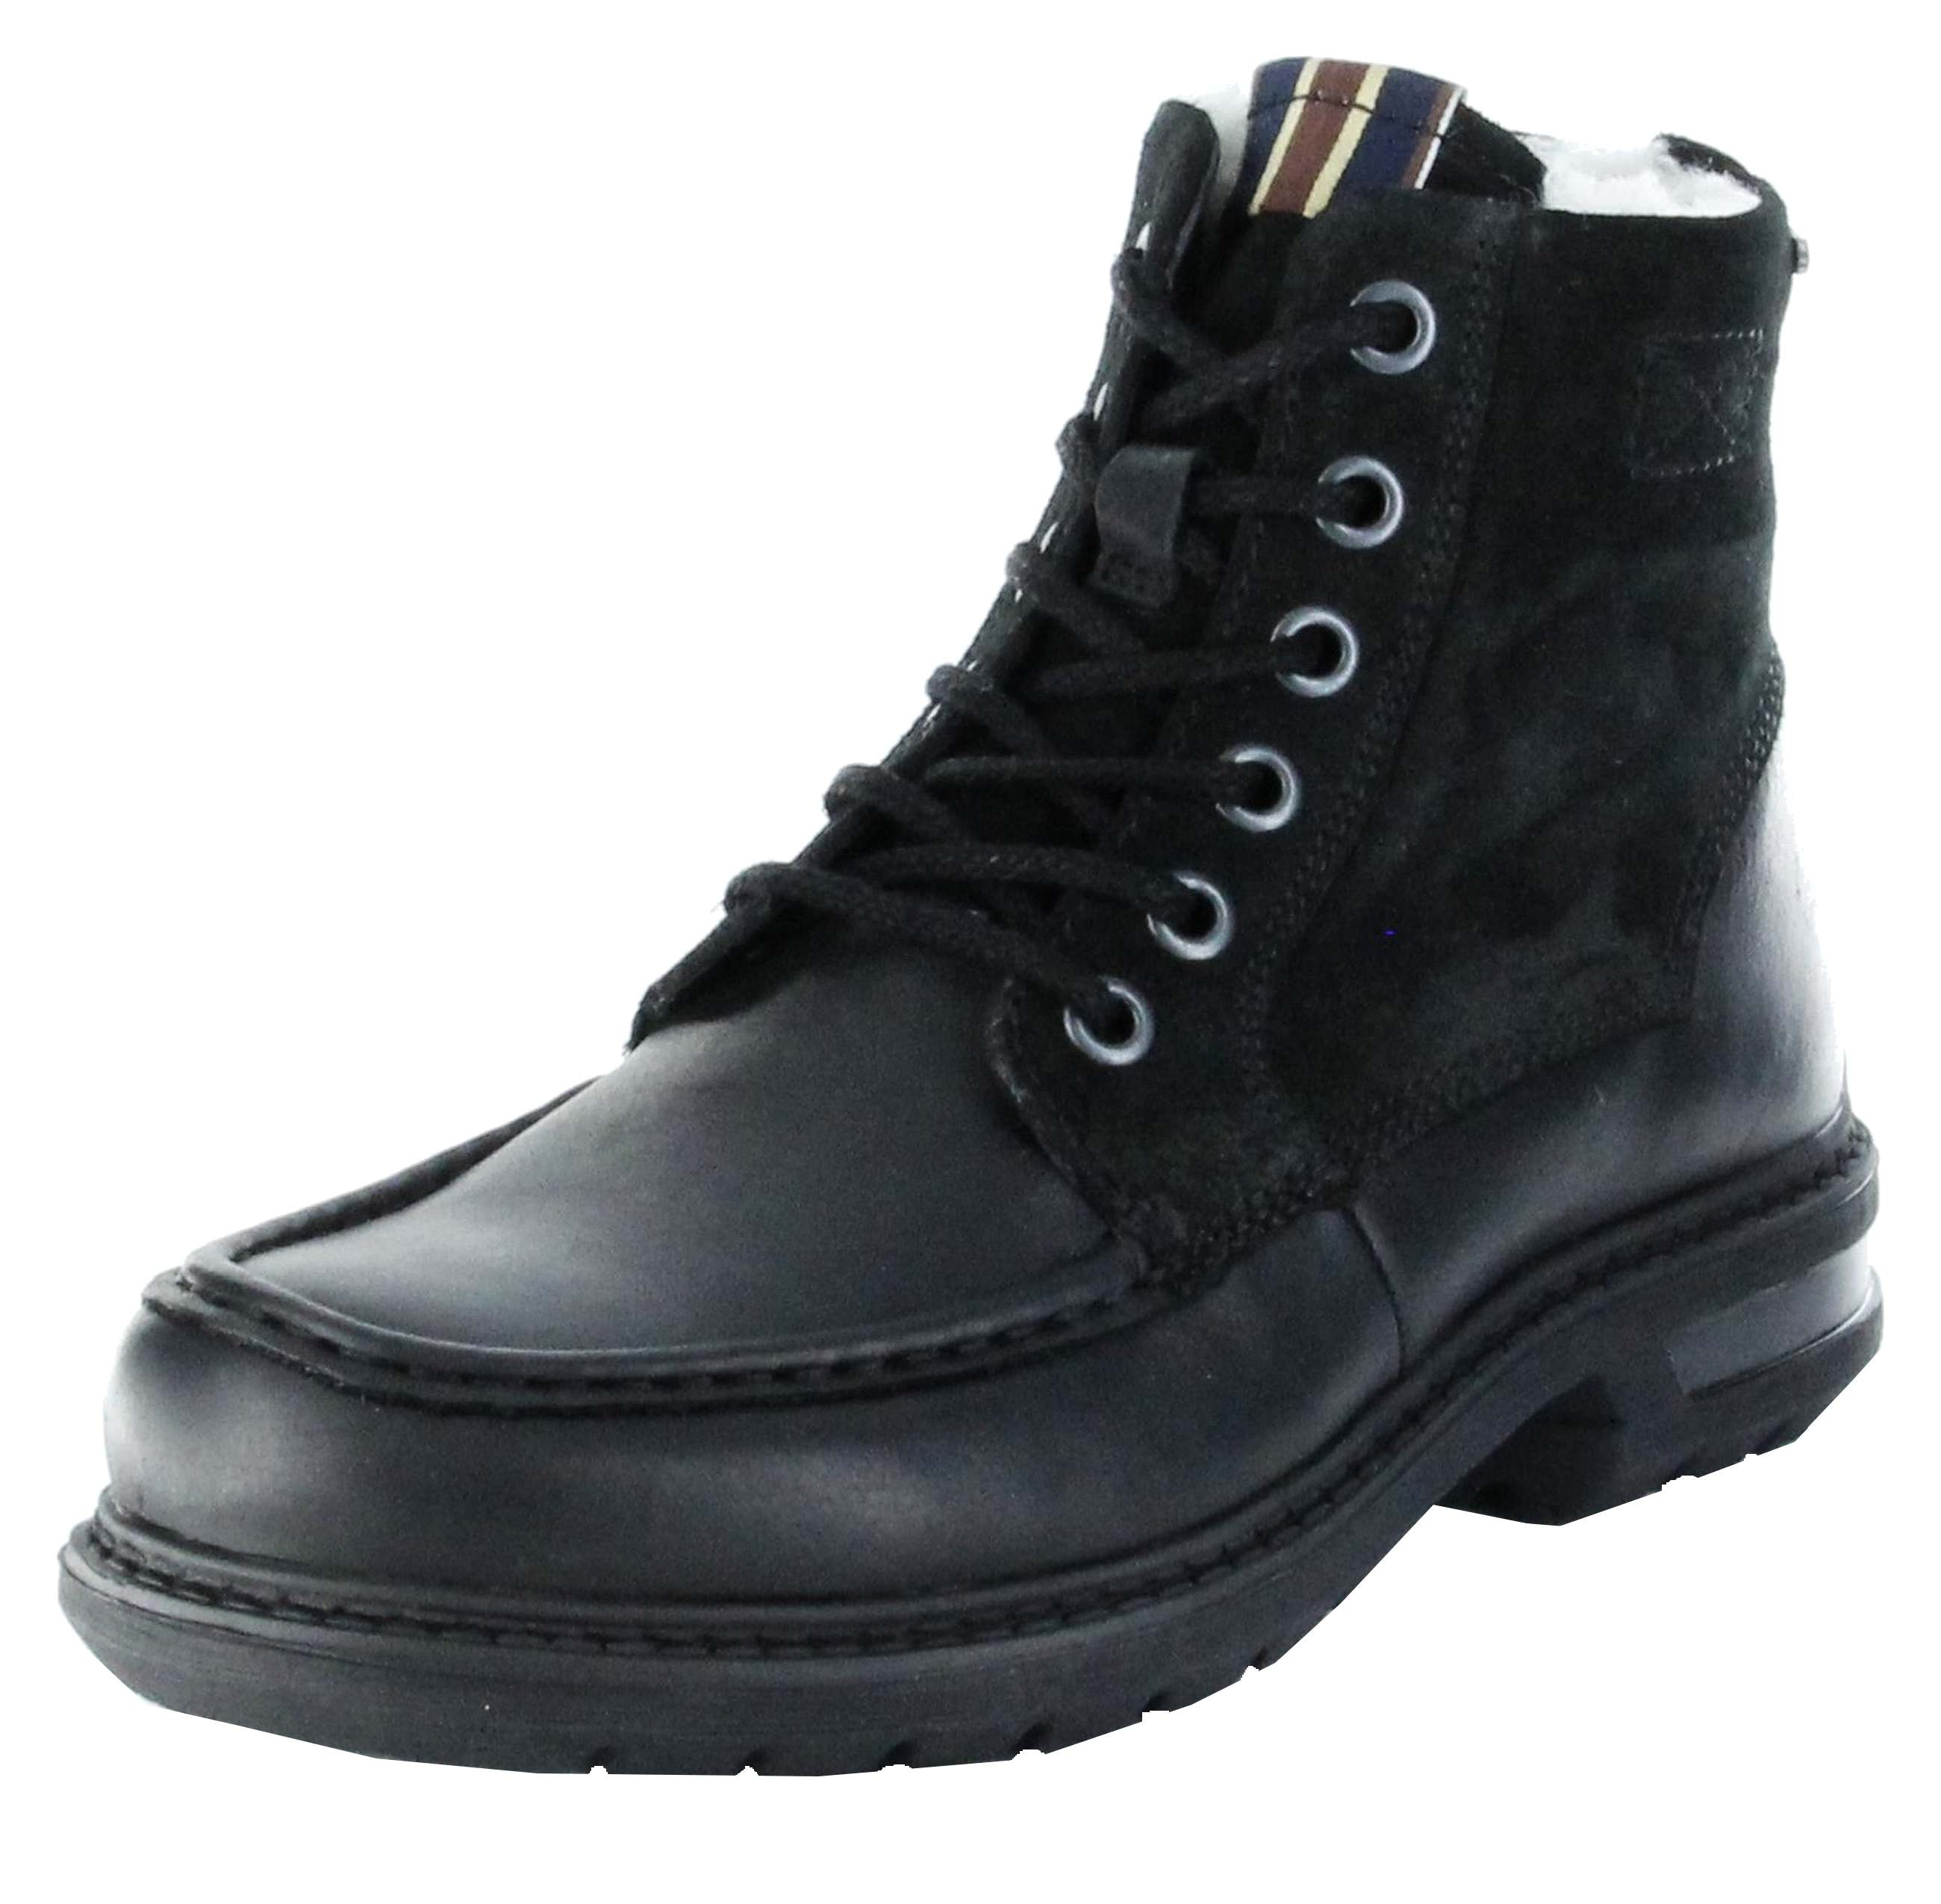 marc stiefel boots schwarz gore tex leder warm herren schuhe colt. Black Bedroom Furniture Sets. Home Design Ideas